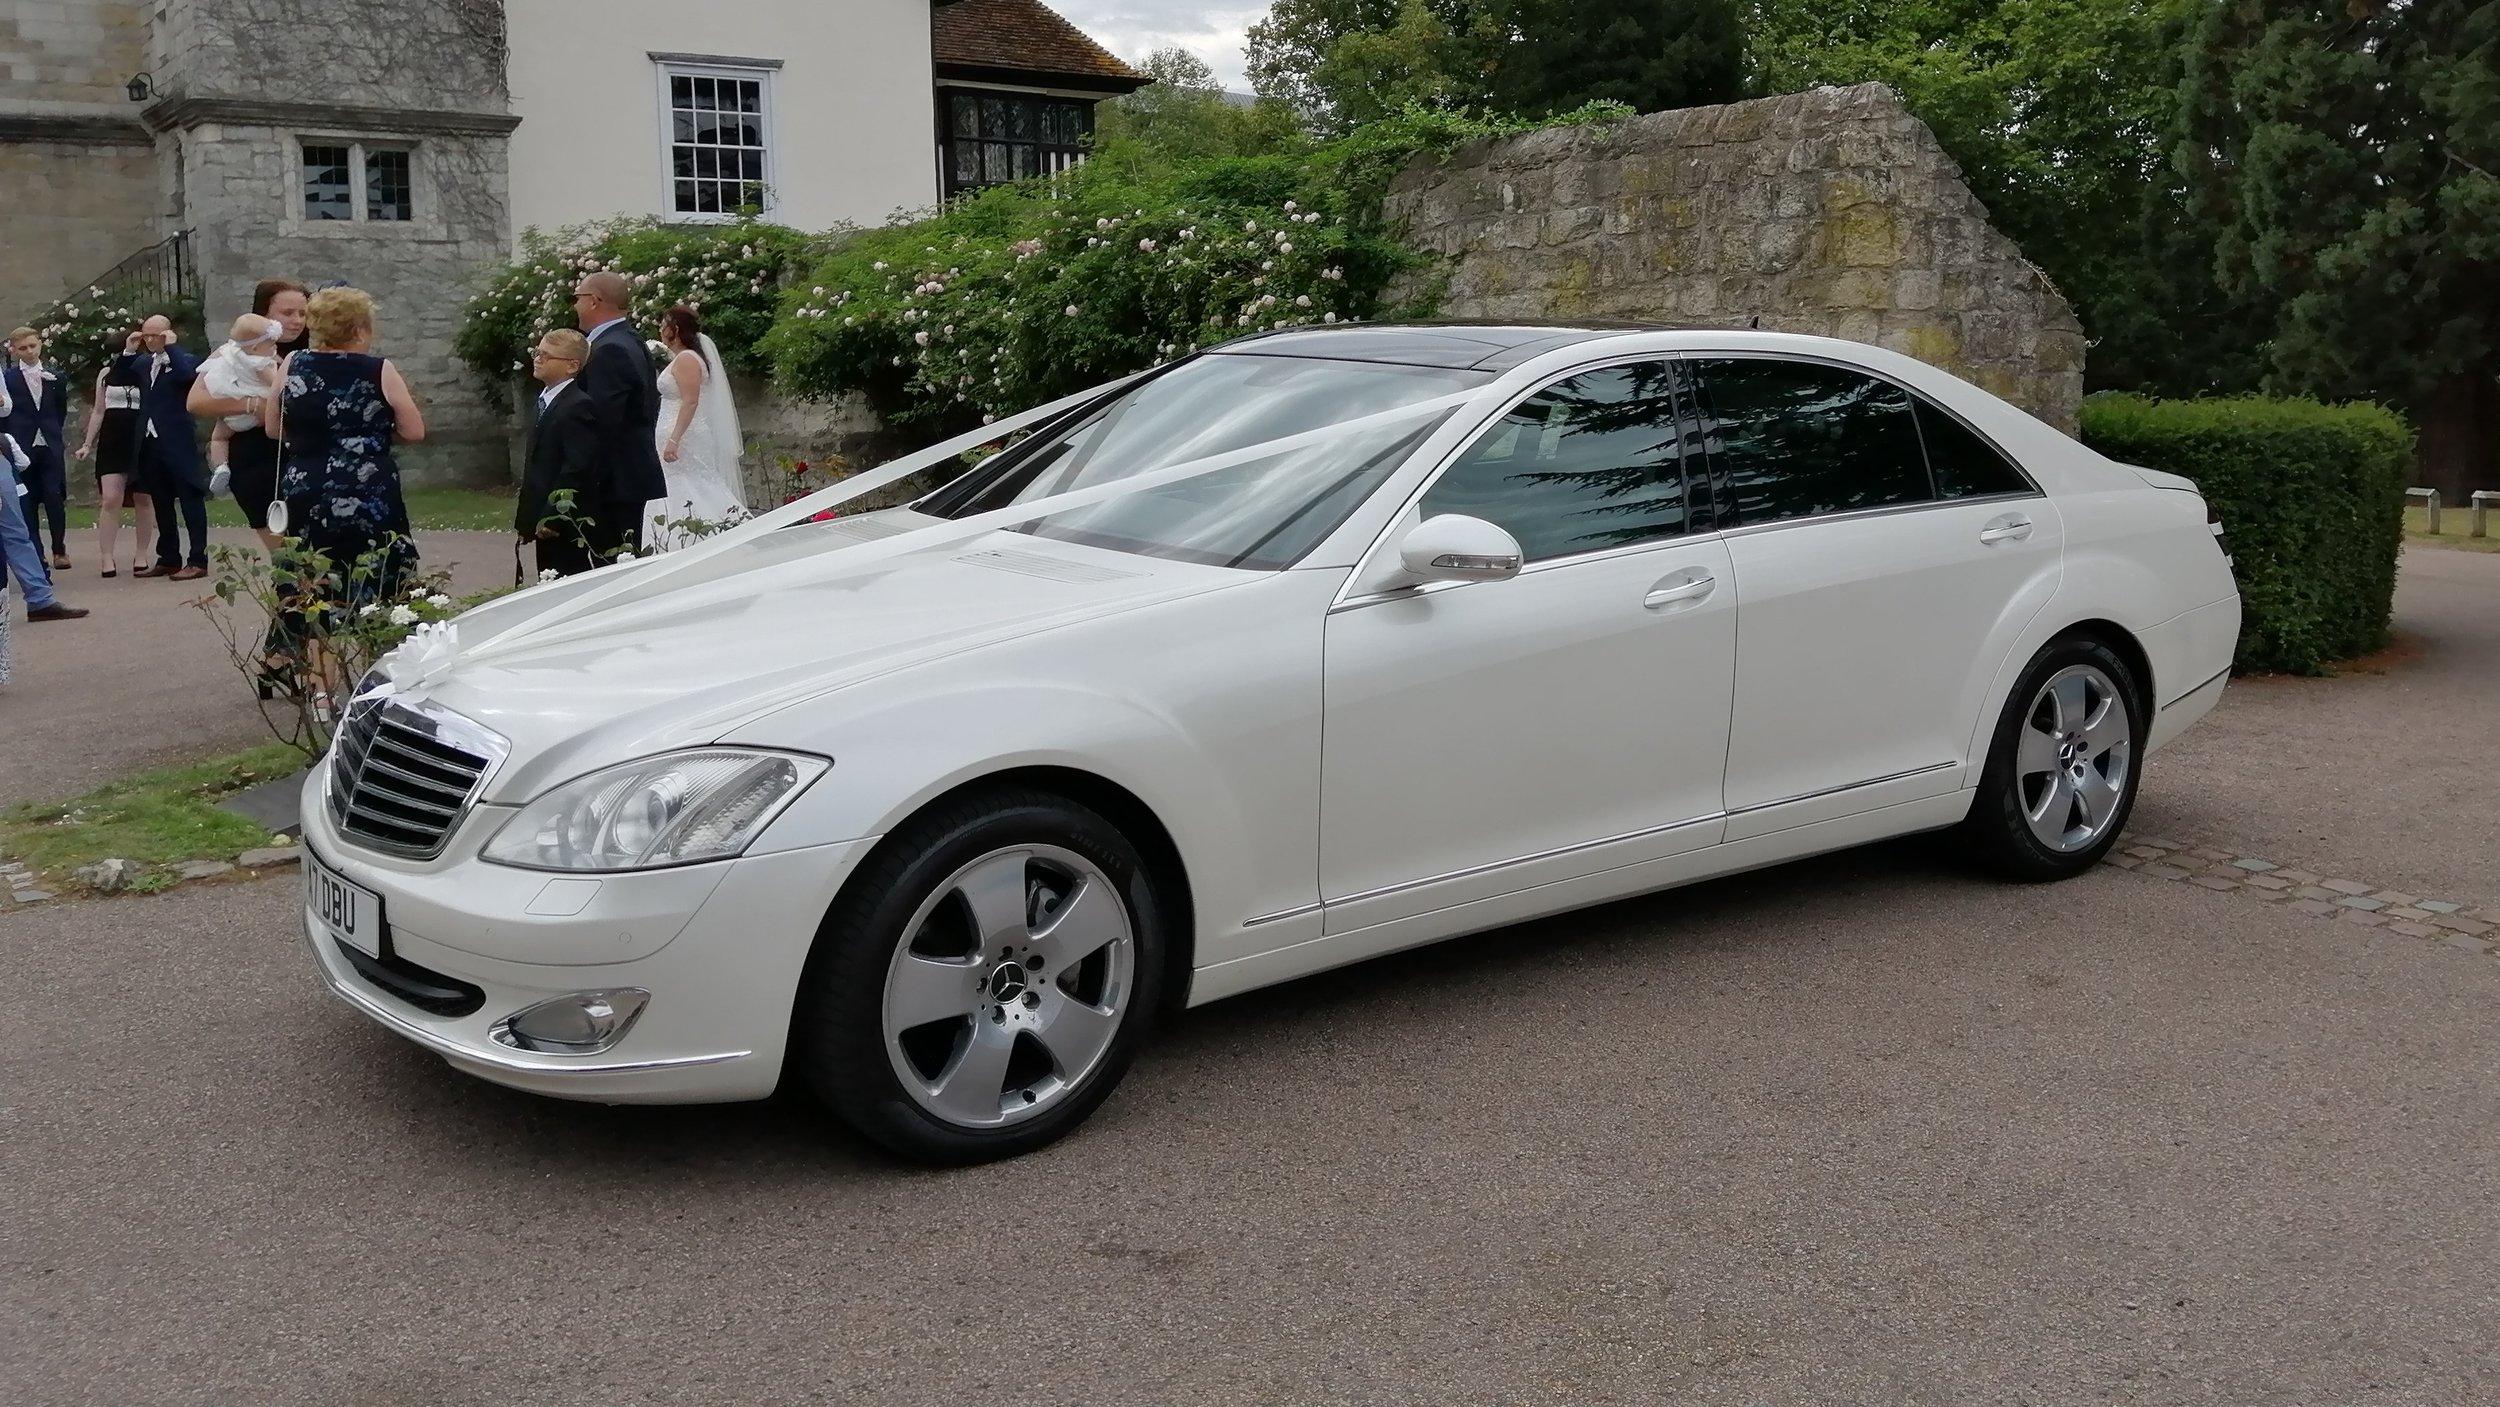 White Mercedes S Class Limousine  —-> Popular